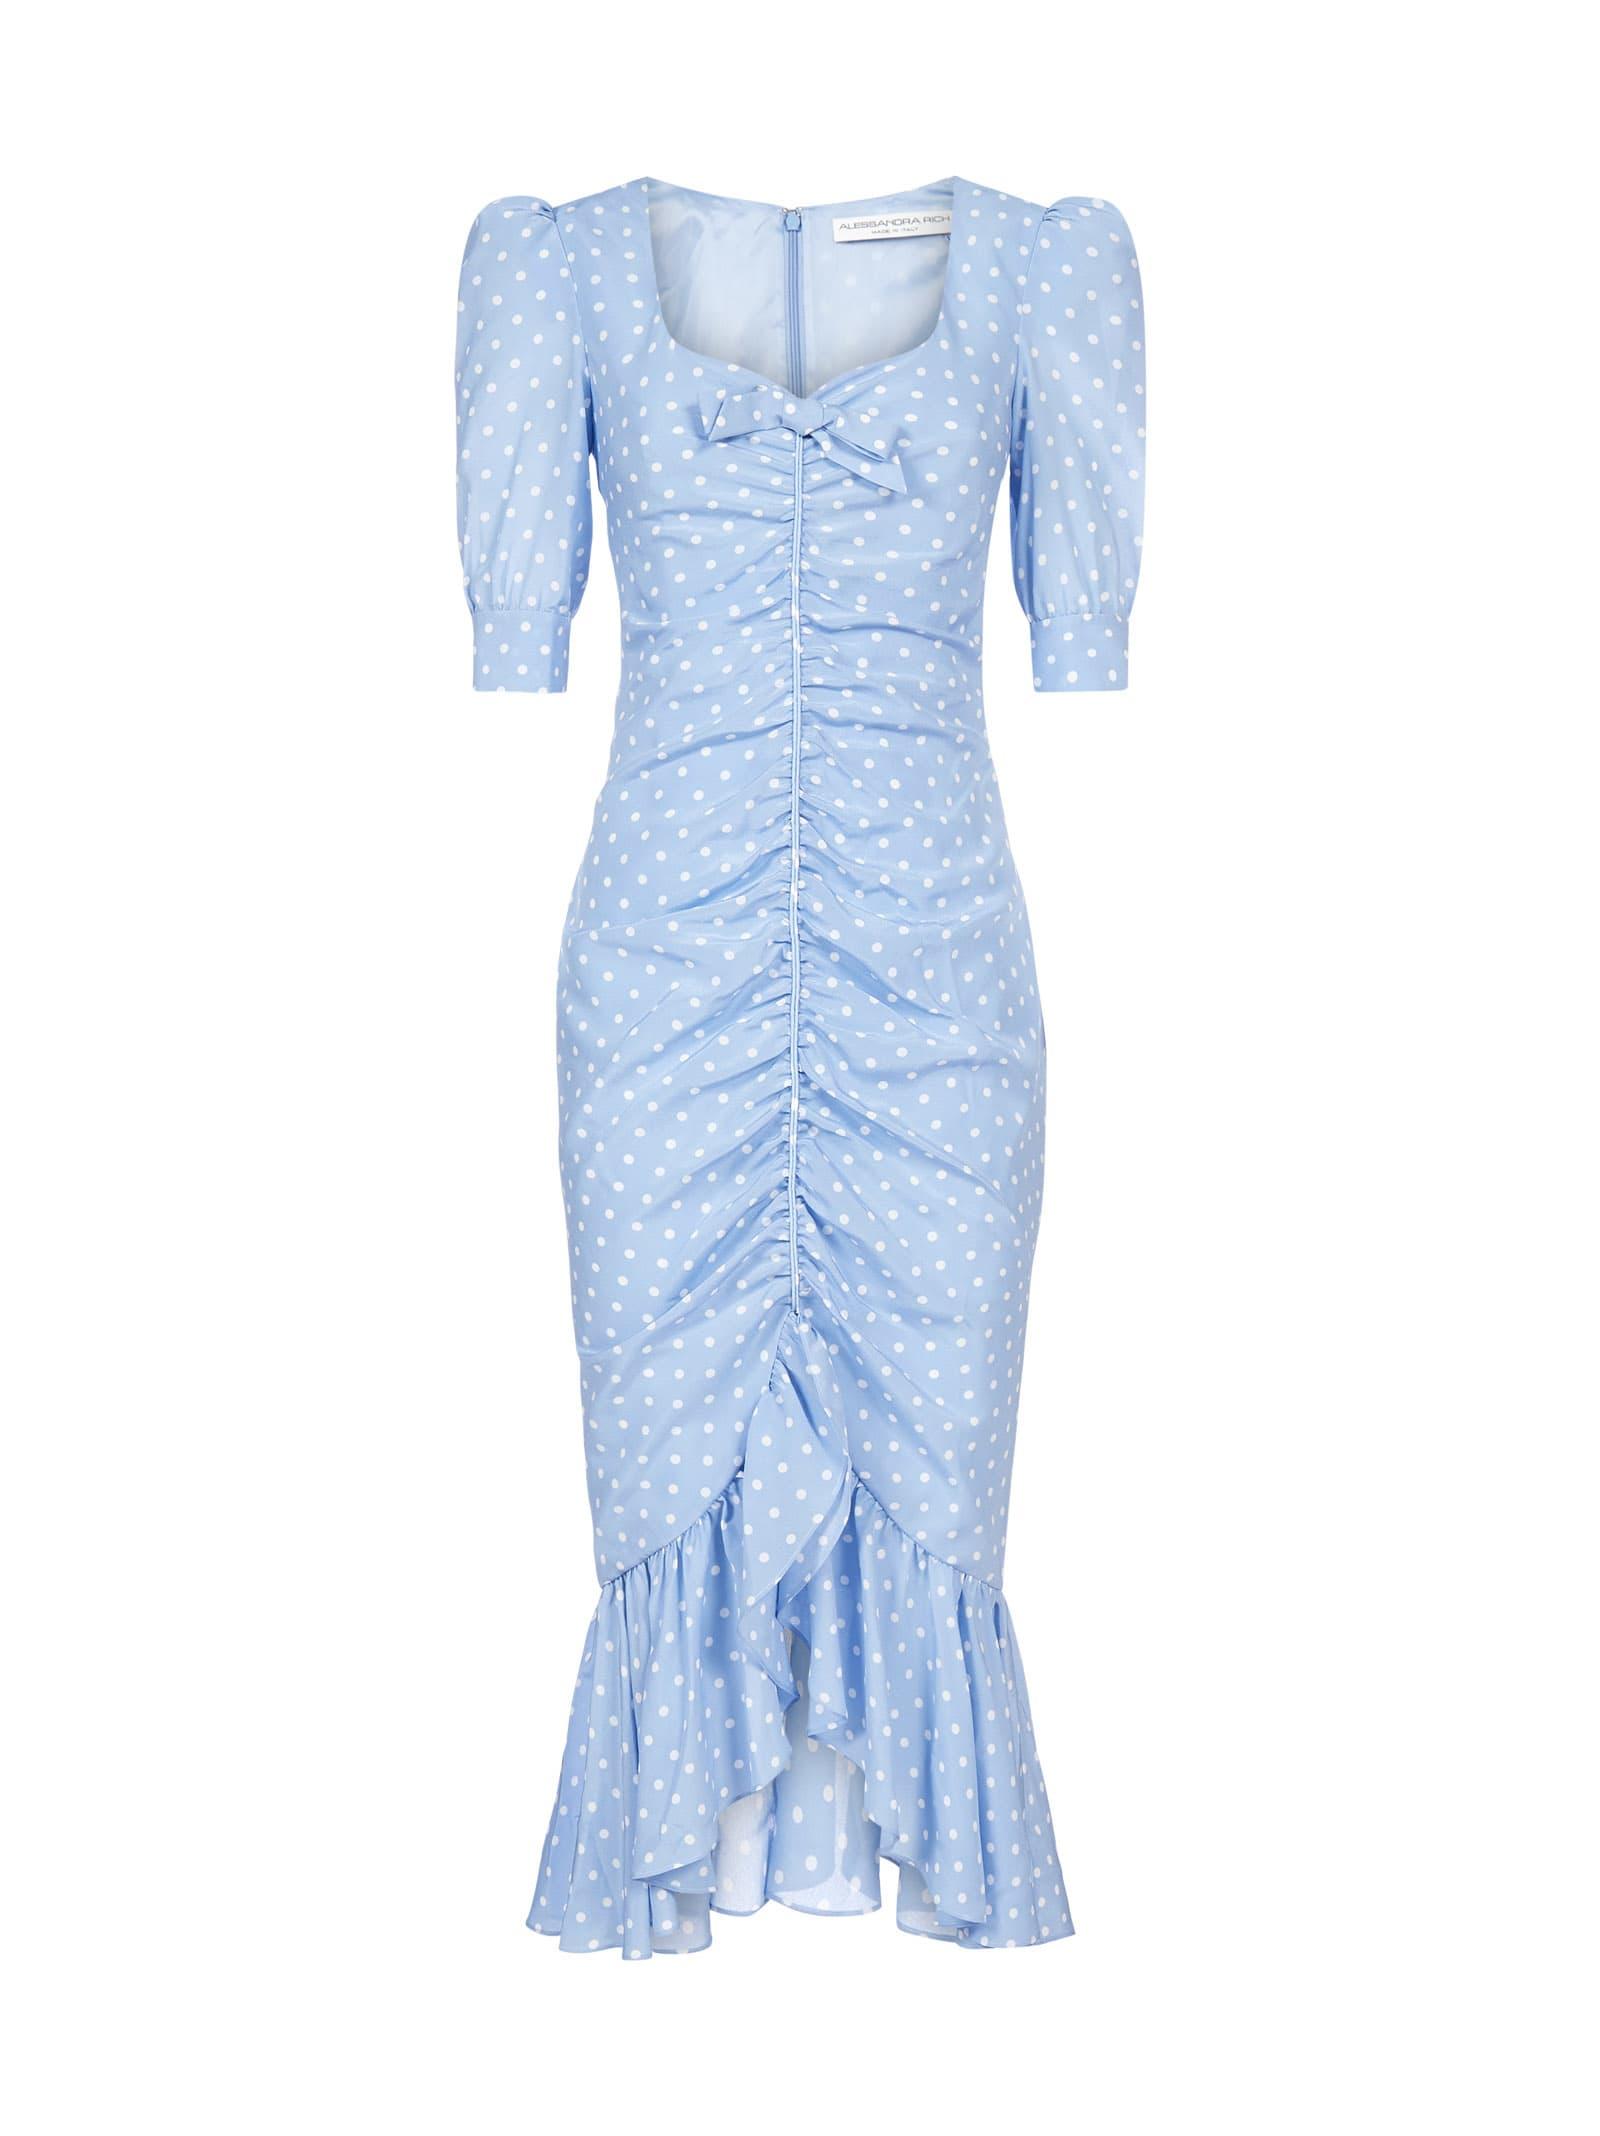 Alessandra Rich Silks DRESS